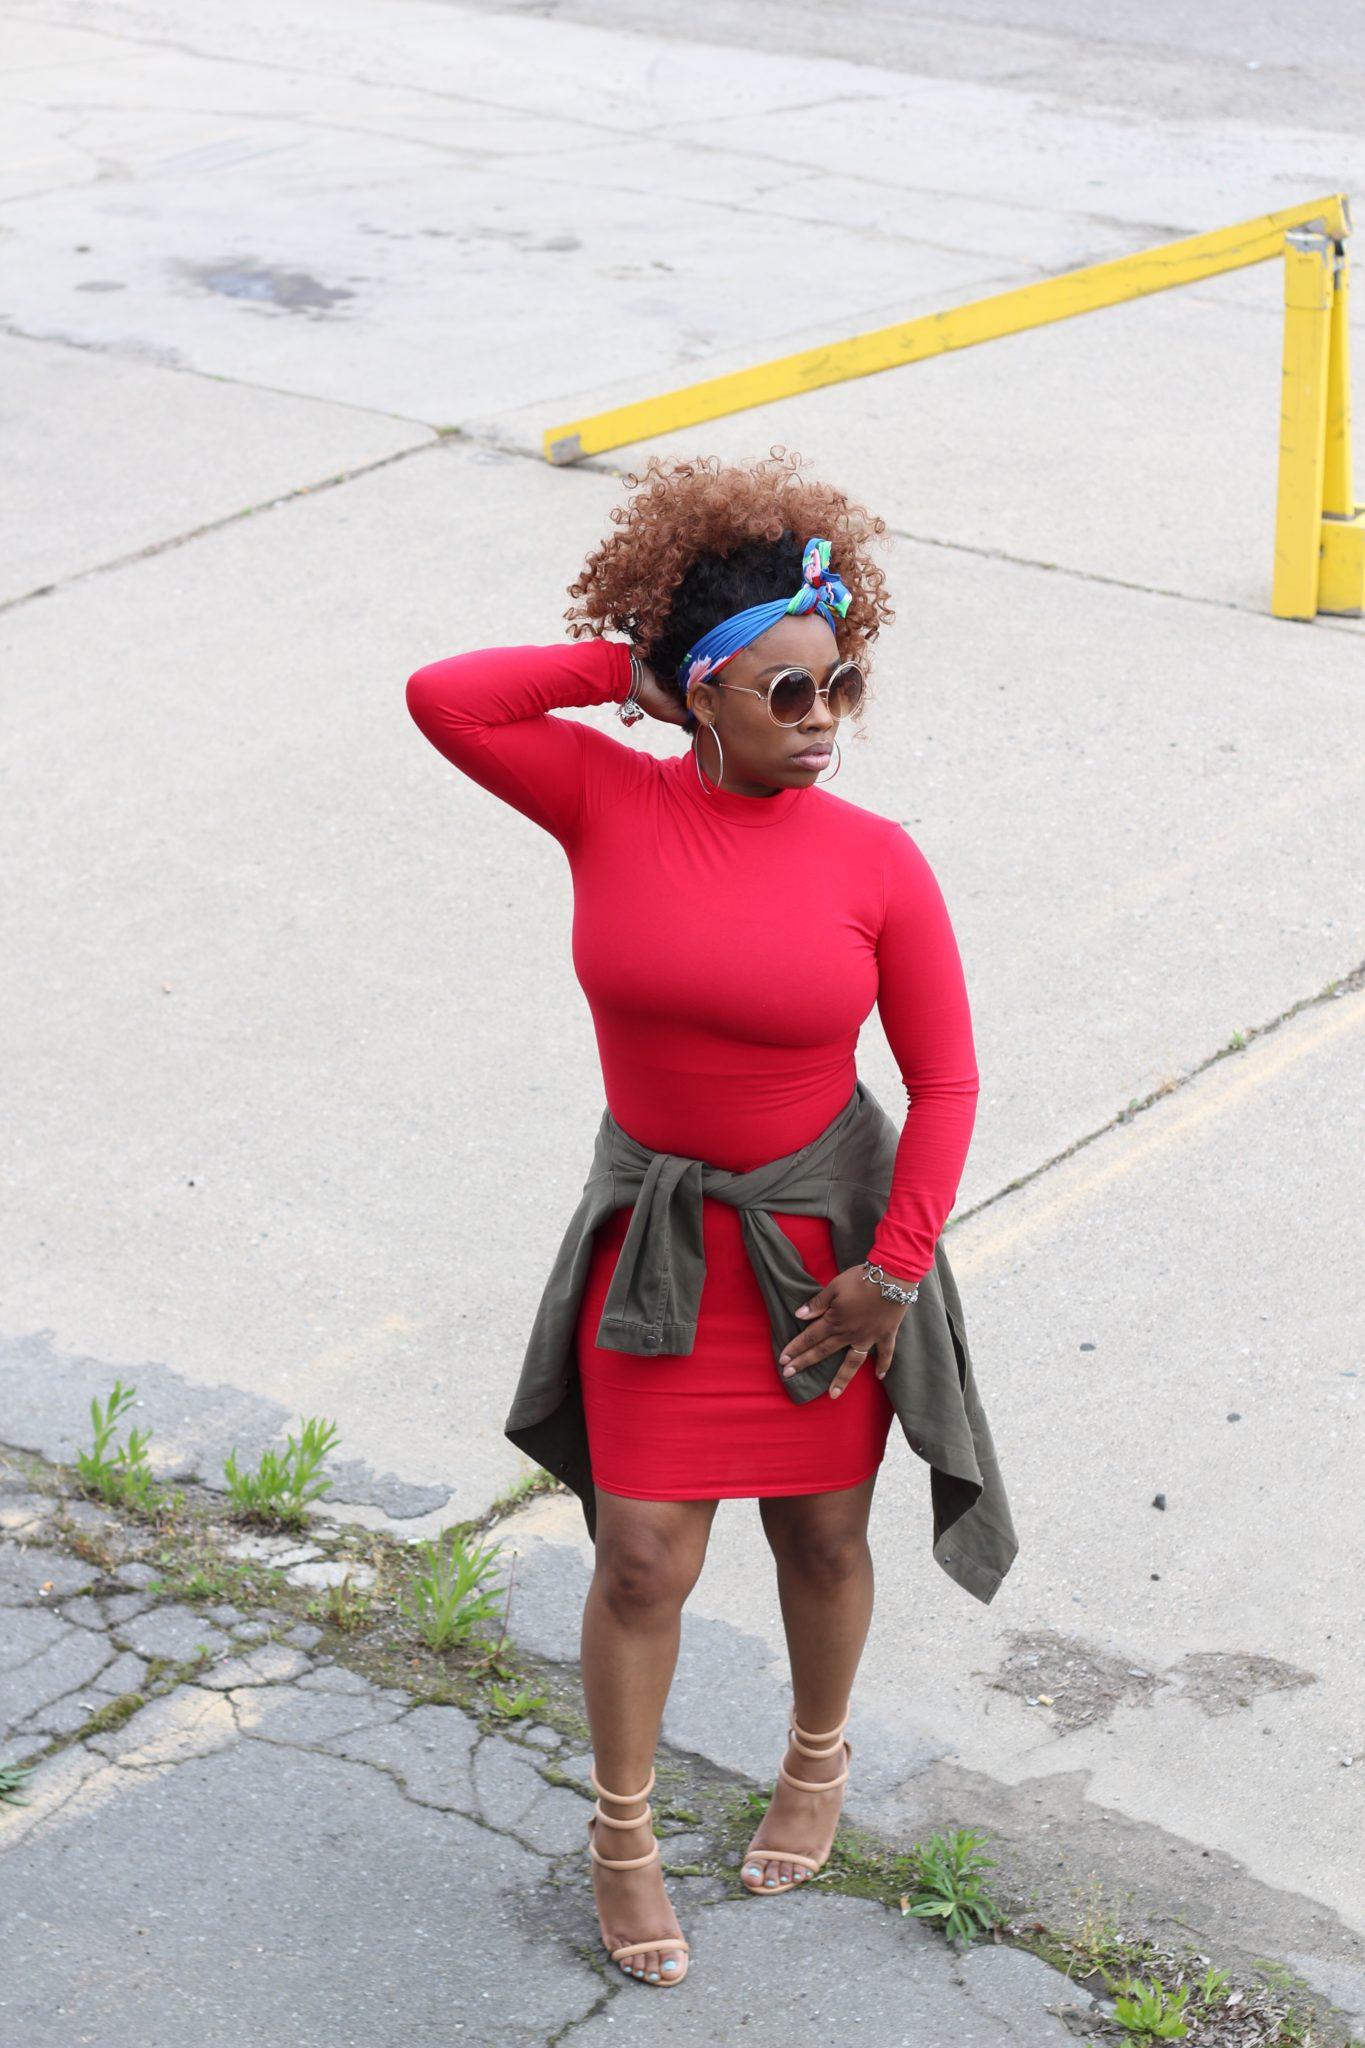 img_5635 Lady n Red (Jingling Baby)Uncategorized